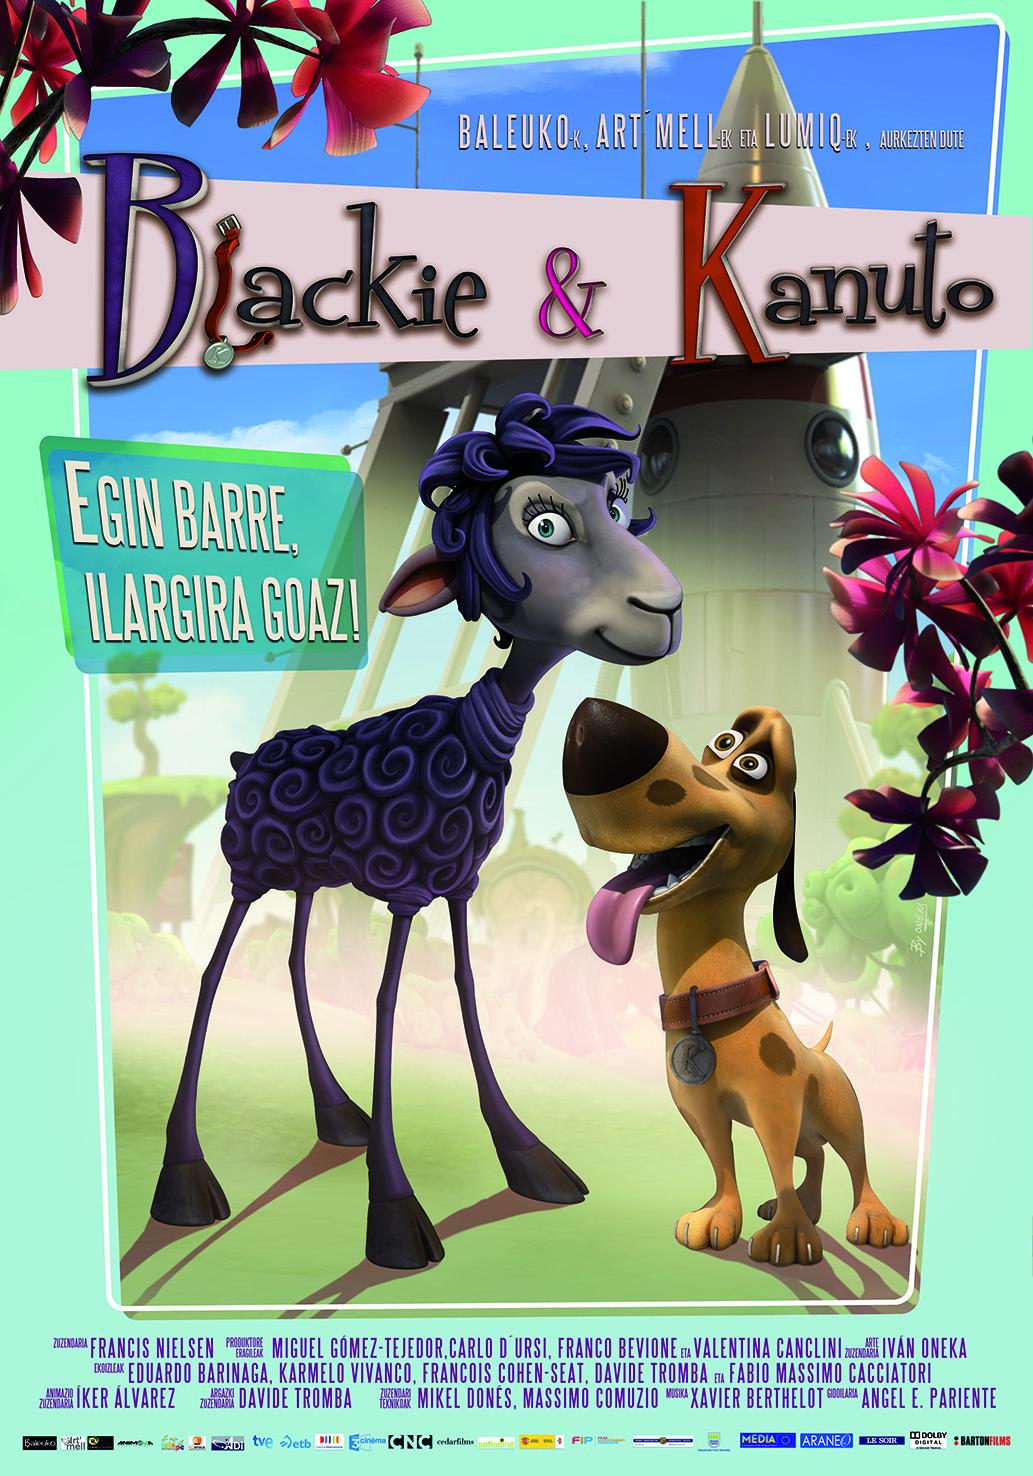 blackie&kanuto_Poster_Eusk